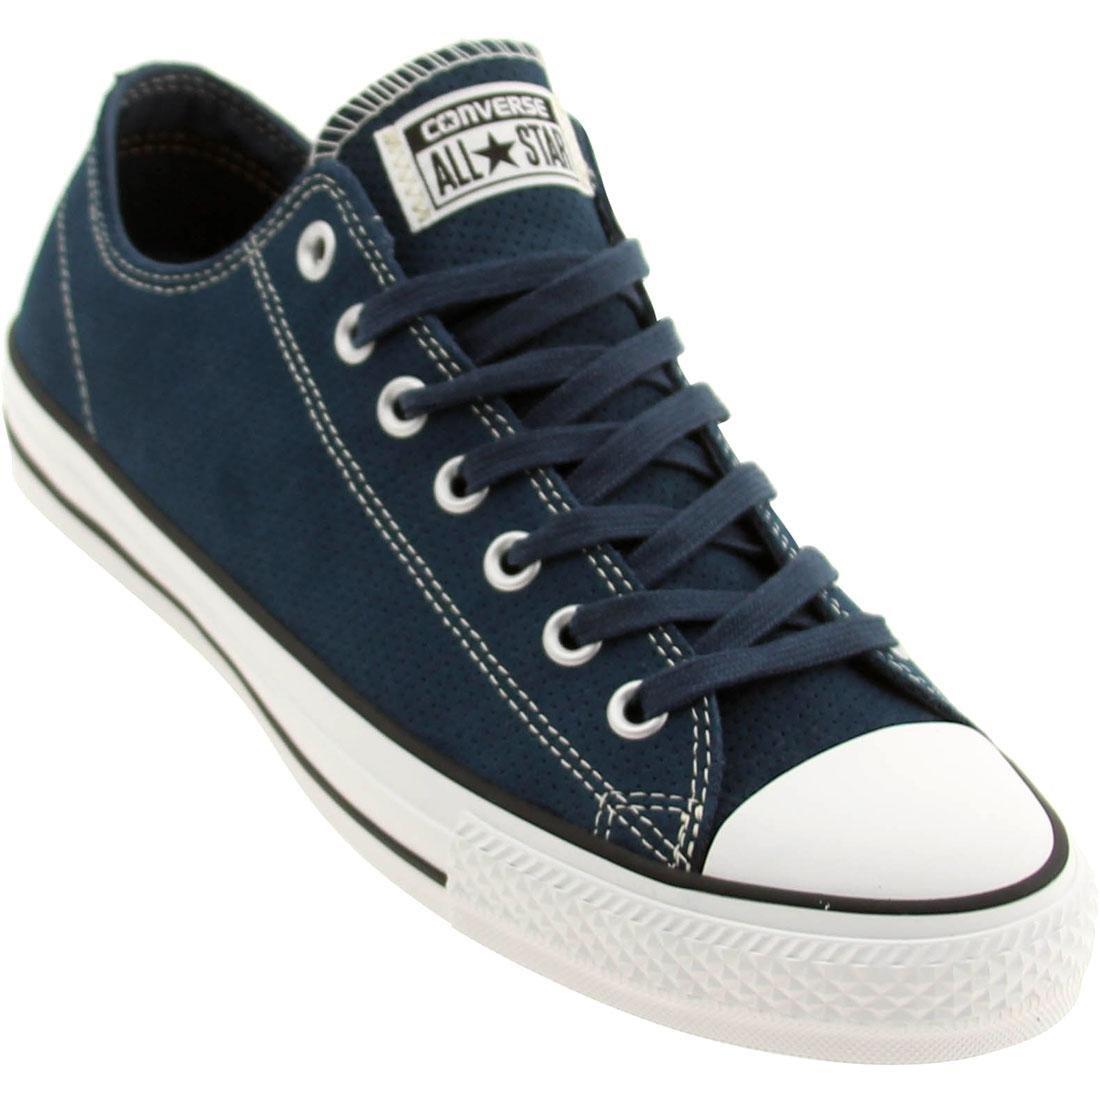 994427a908ec3b Converse Men Chuck Taylor All Star Pro Ox (Navy Moonlight   White)   Amazon.ca  Shoes   Handbags